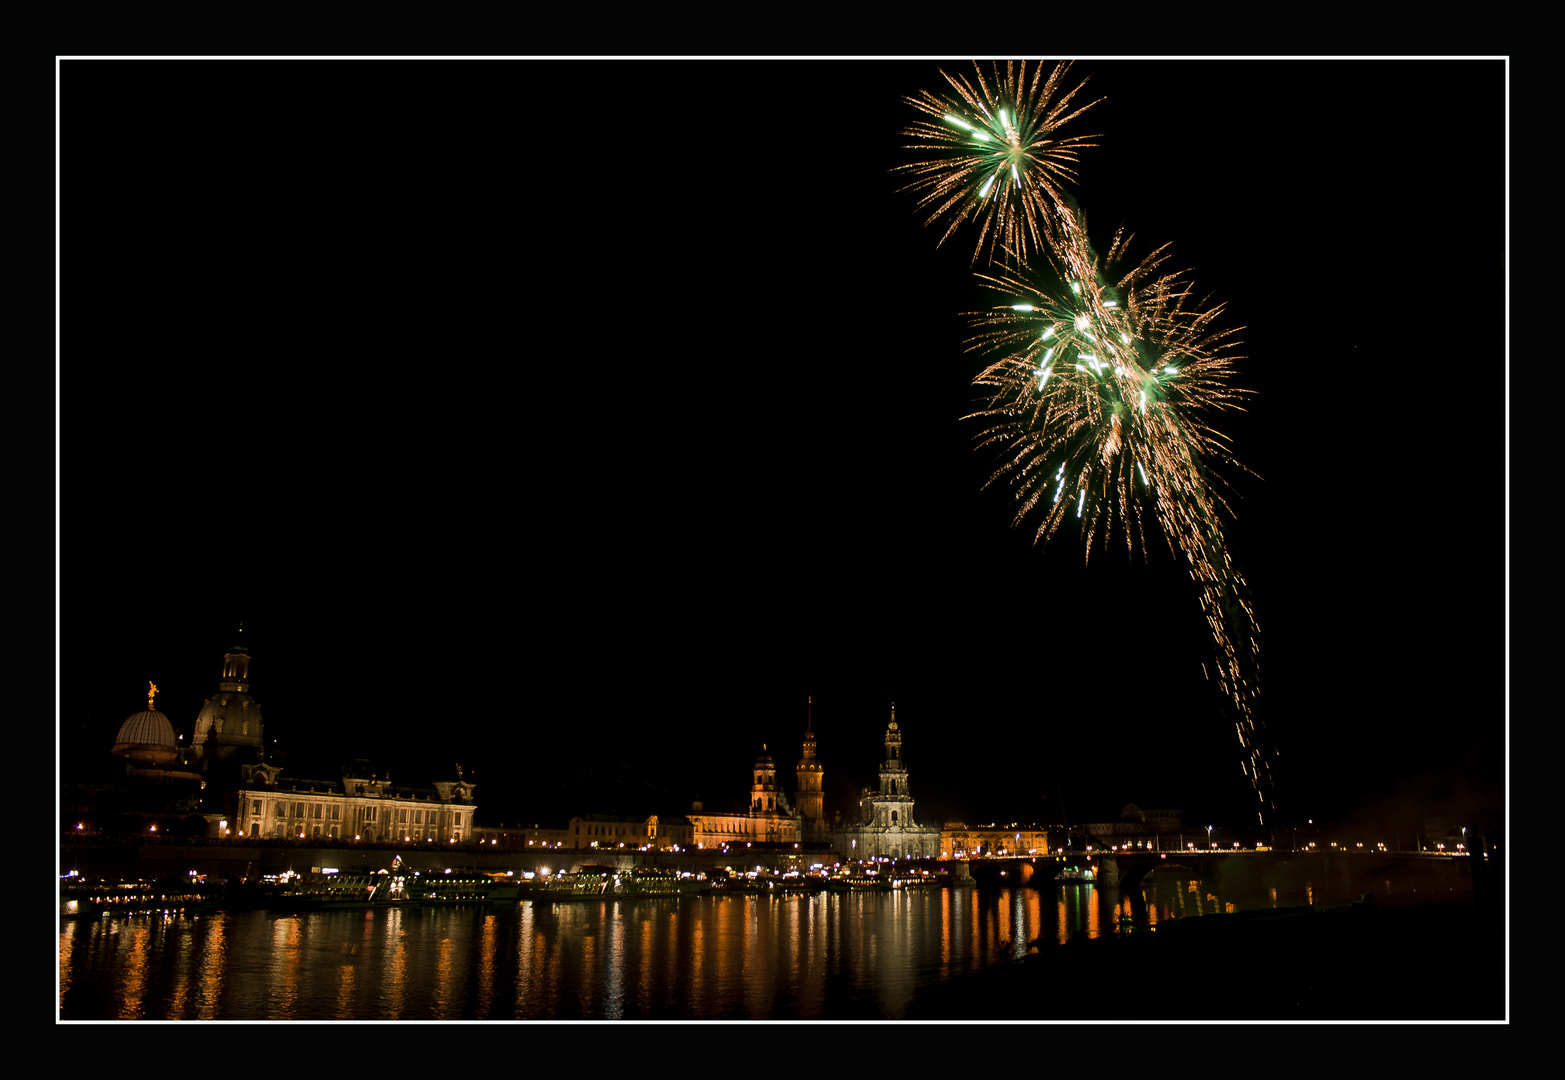 Stadtfest in Dresden